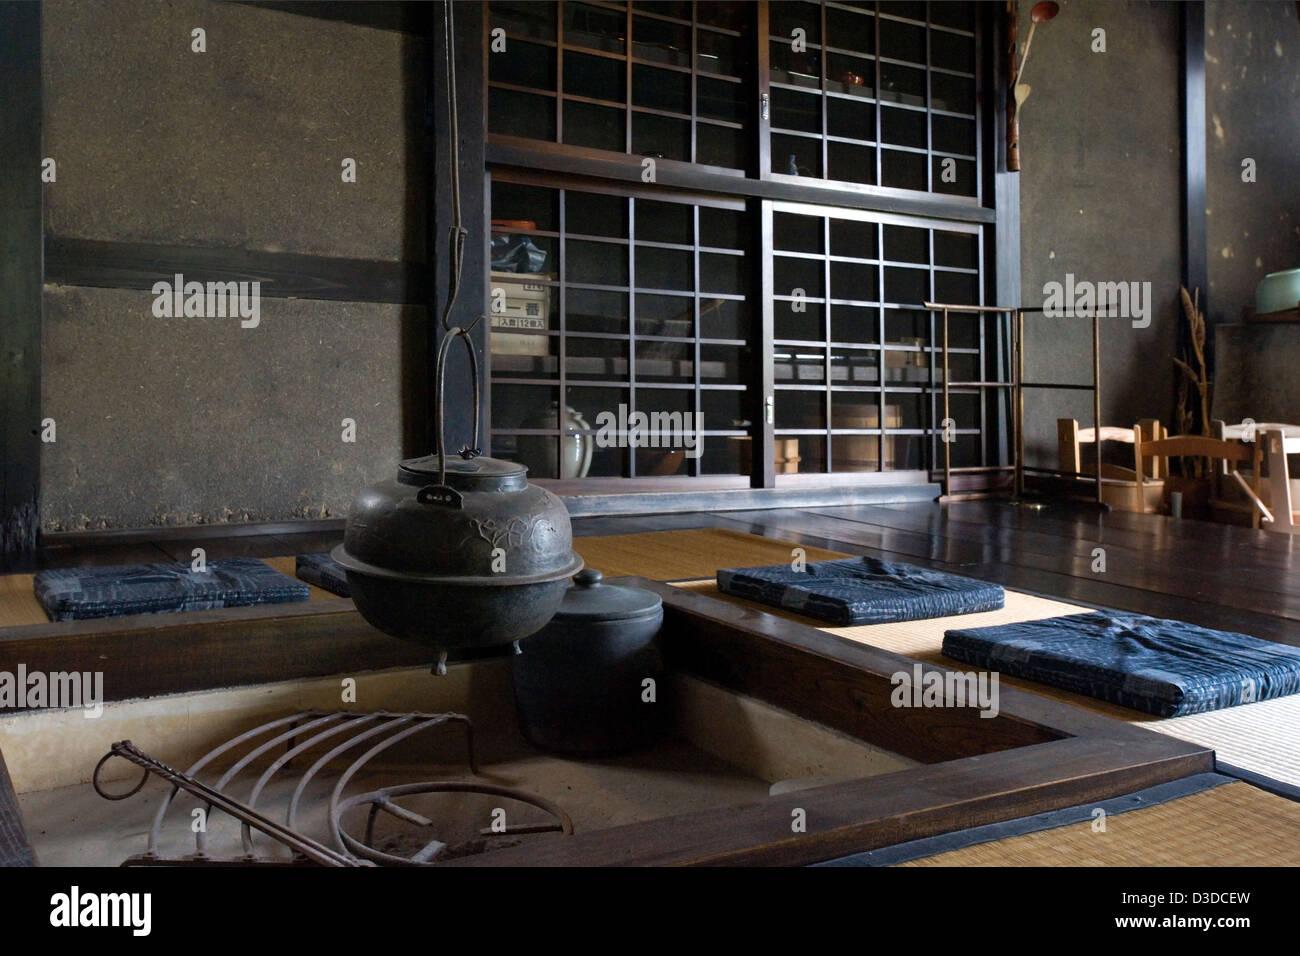 Traditionelle Irori Versunkenen Kamin Feuerstelle Mit Kessel In  Historischen Bukeyashiki Kyu Uchiyamake Samurai Haus, Echizen Ono, Fukui